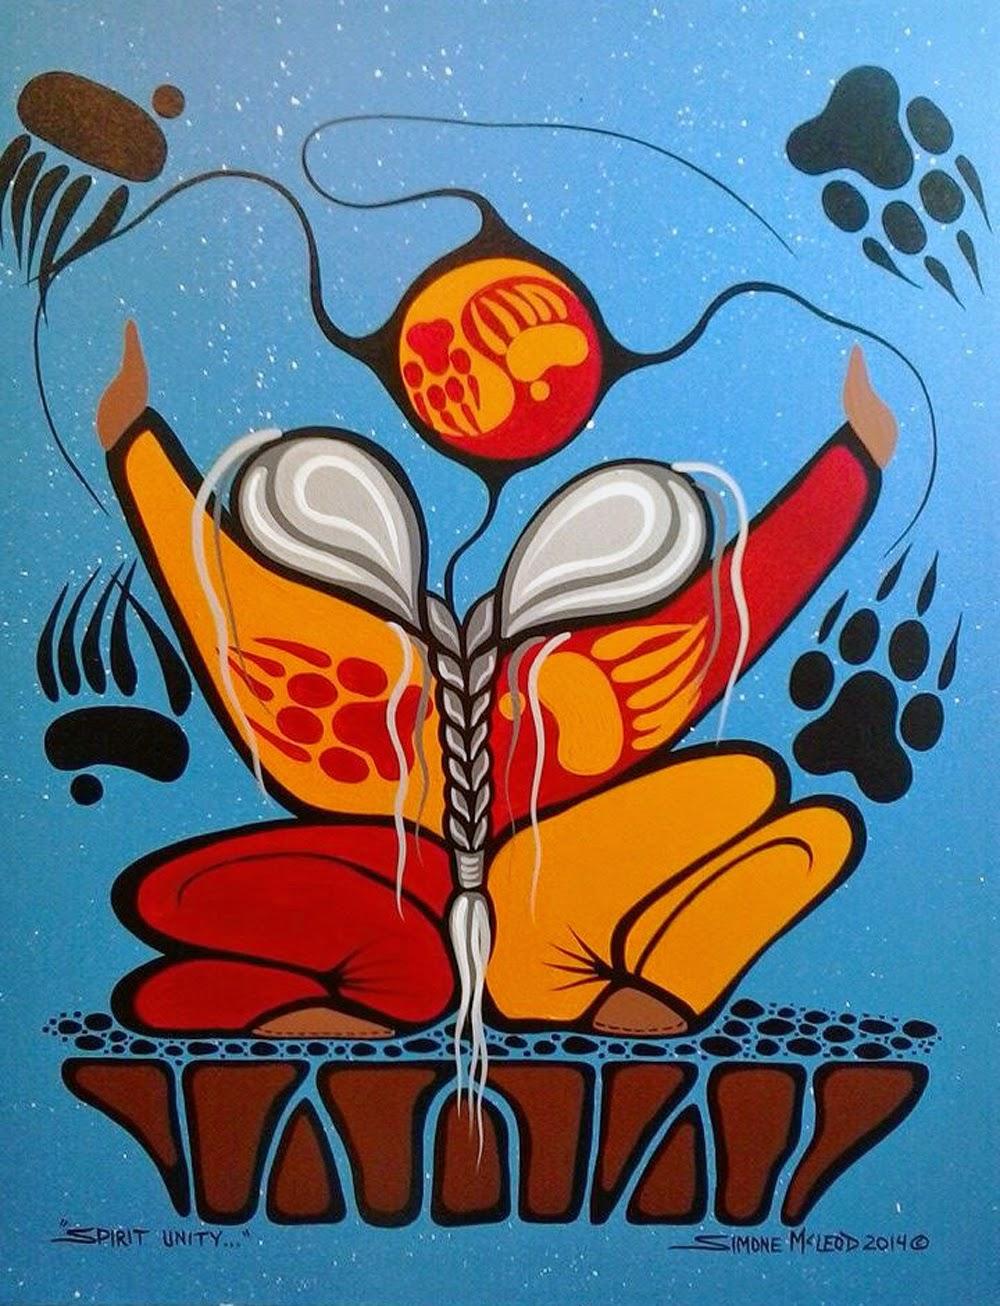 Acrylic painting by Aki-egwaniizid